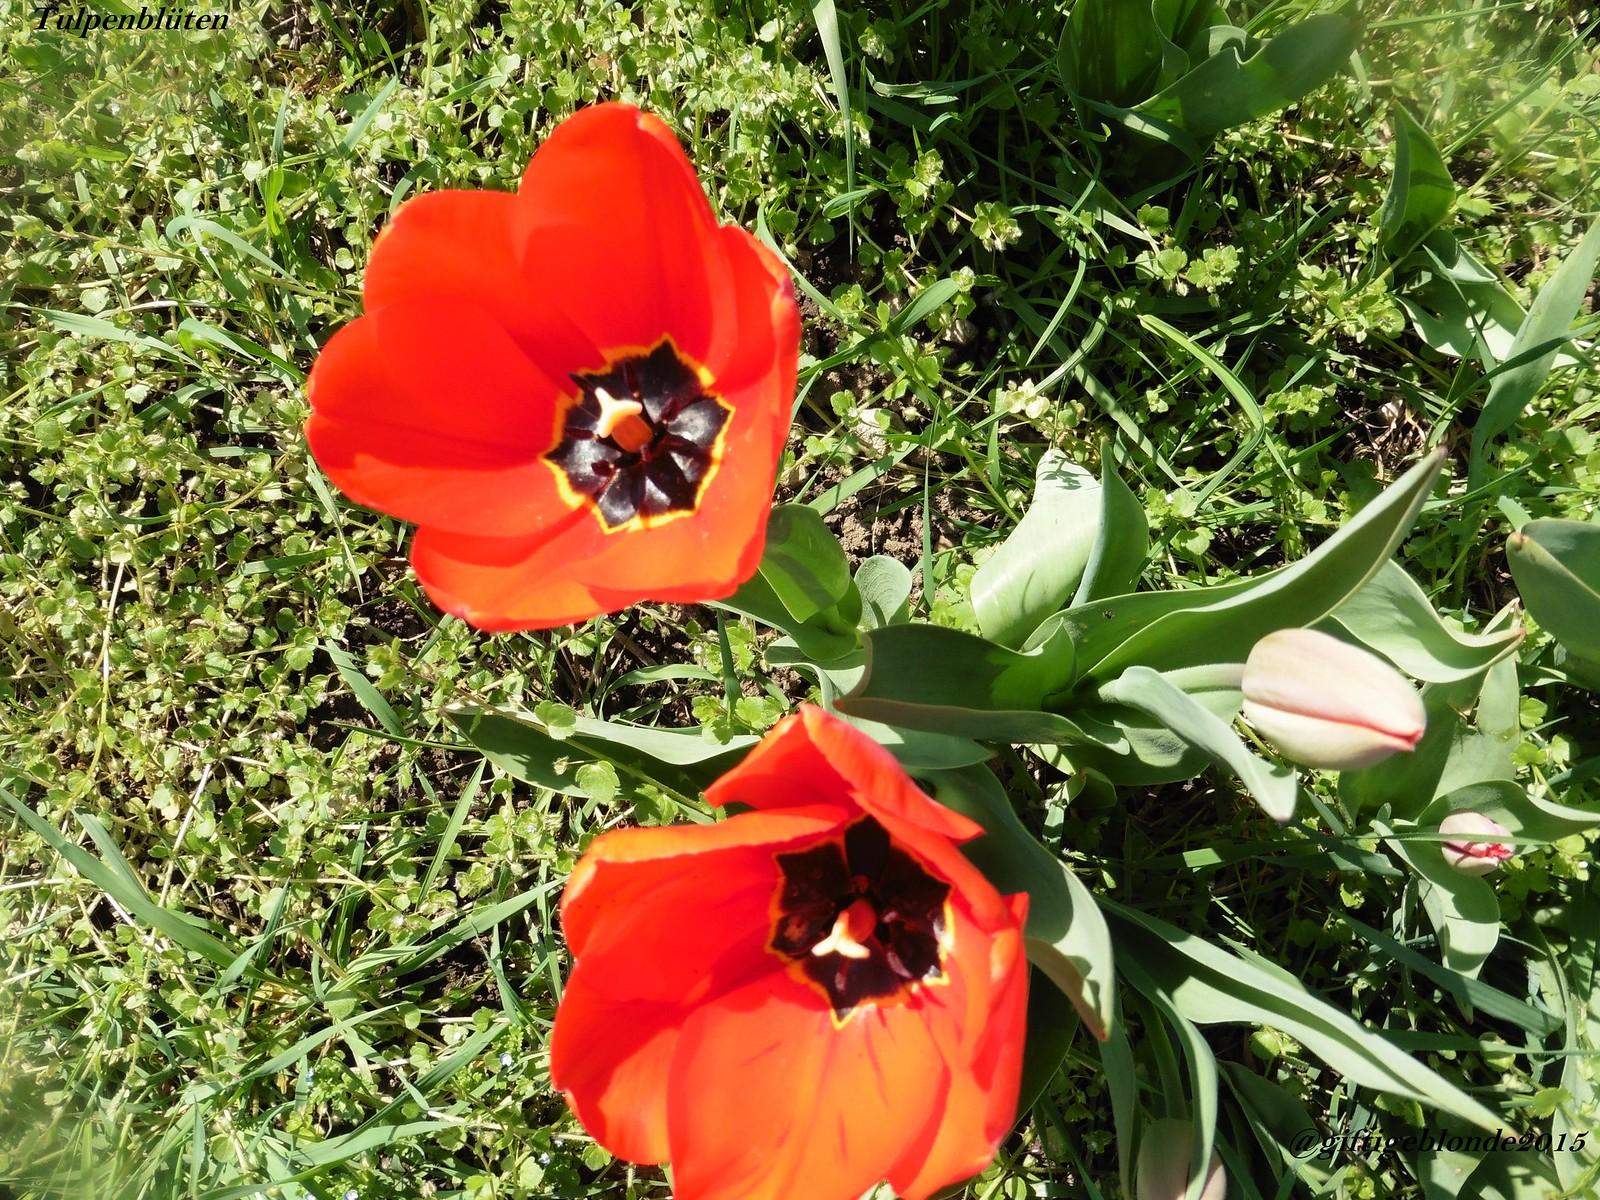 Tulpen, April 2015